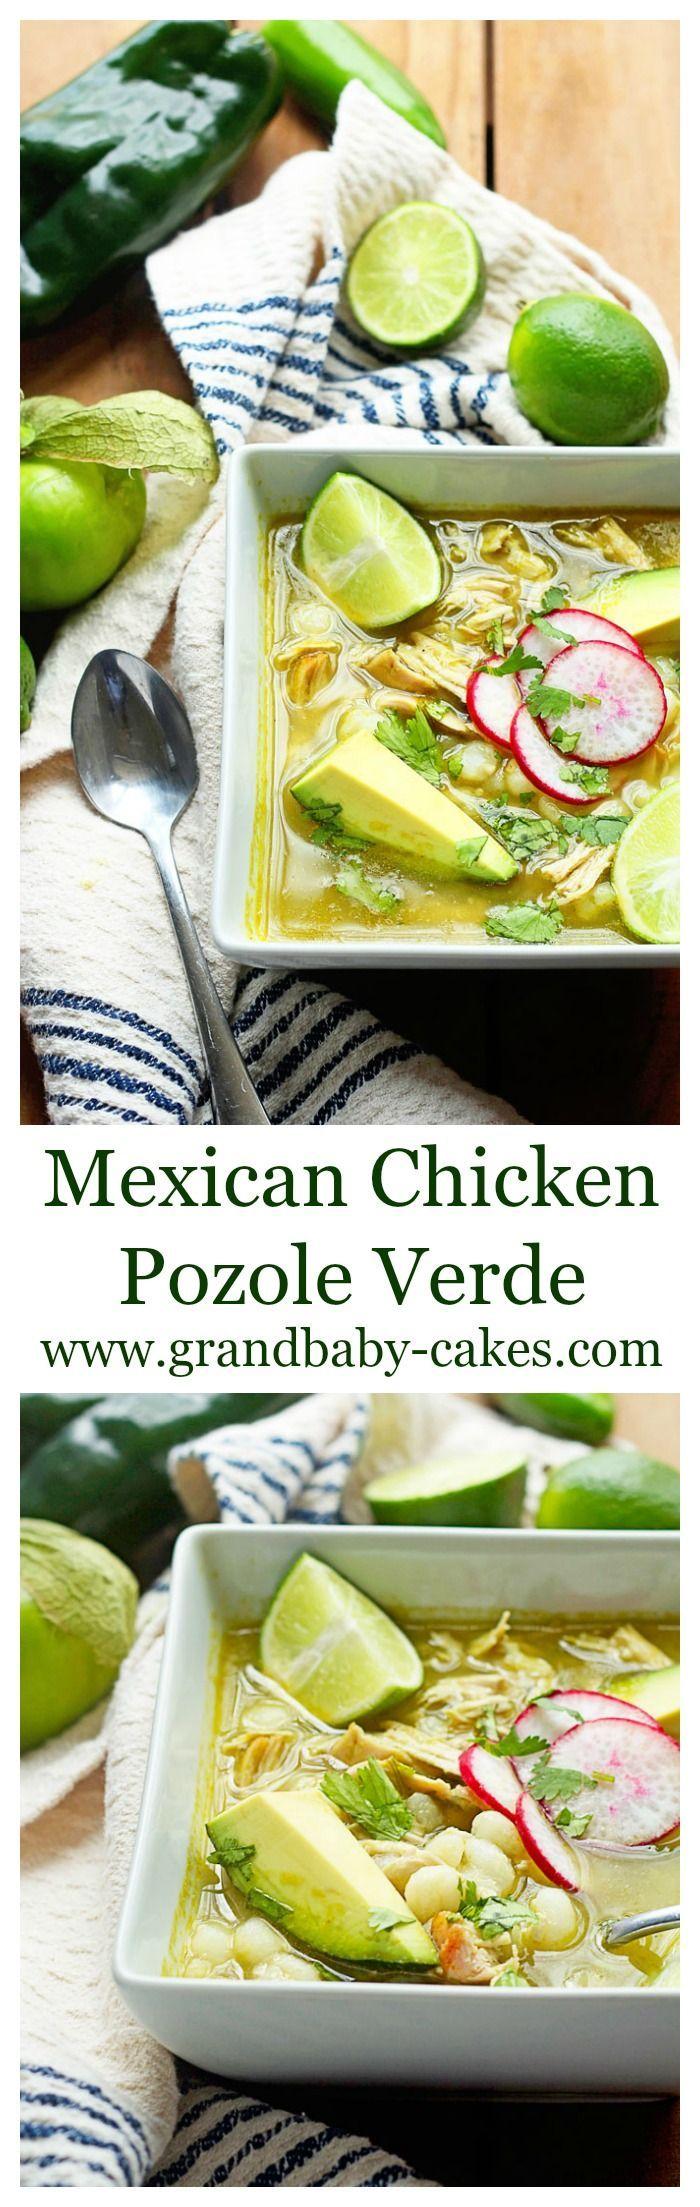 Mexican Chicken Pozole Verde | Grandbaby Cakes ~ http://www.grandbaby-cakes.com